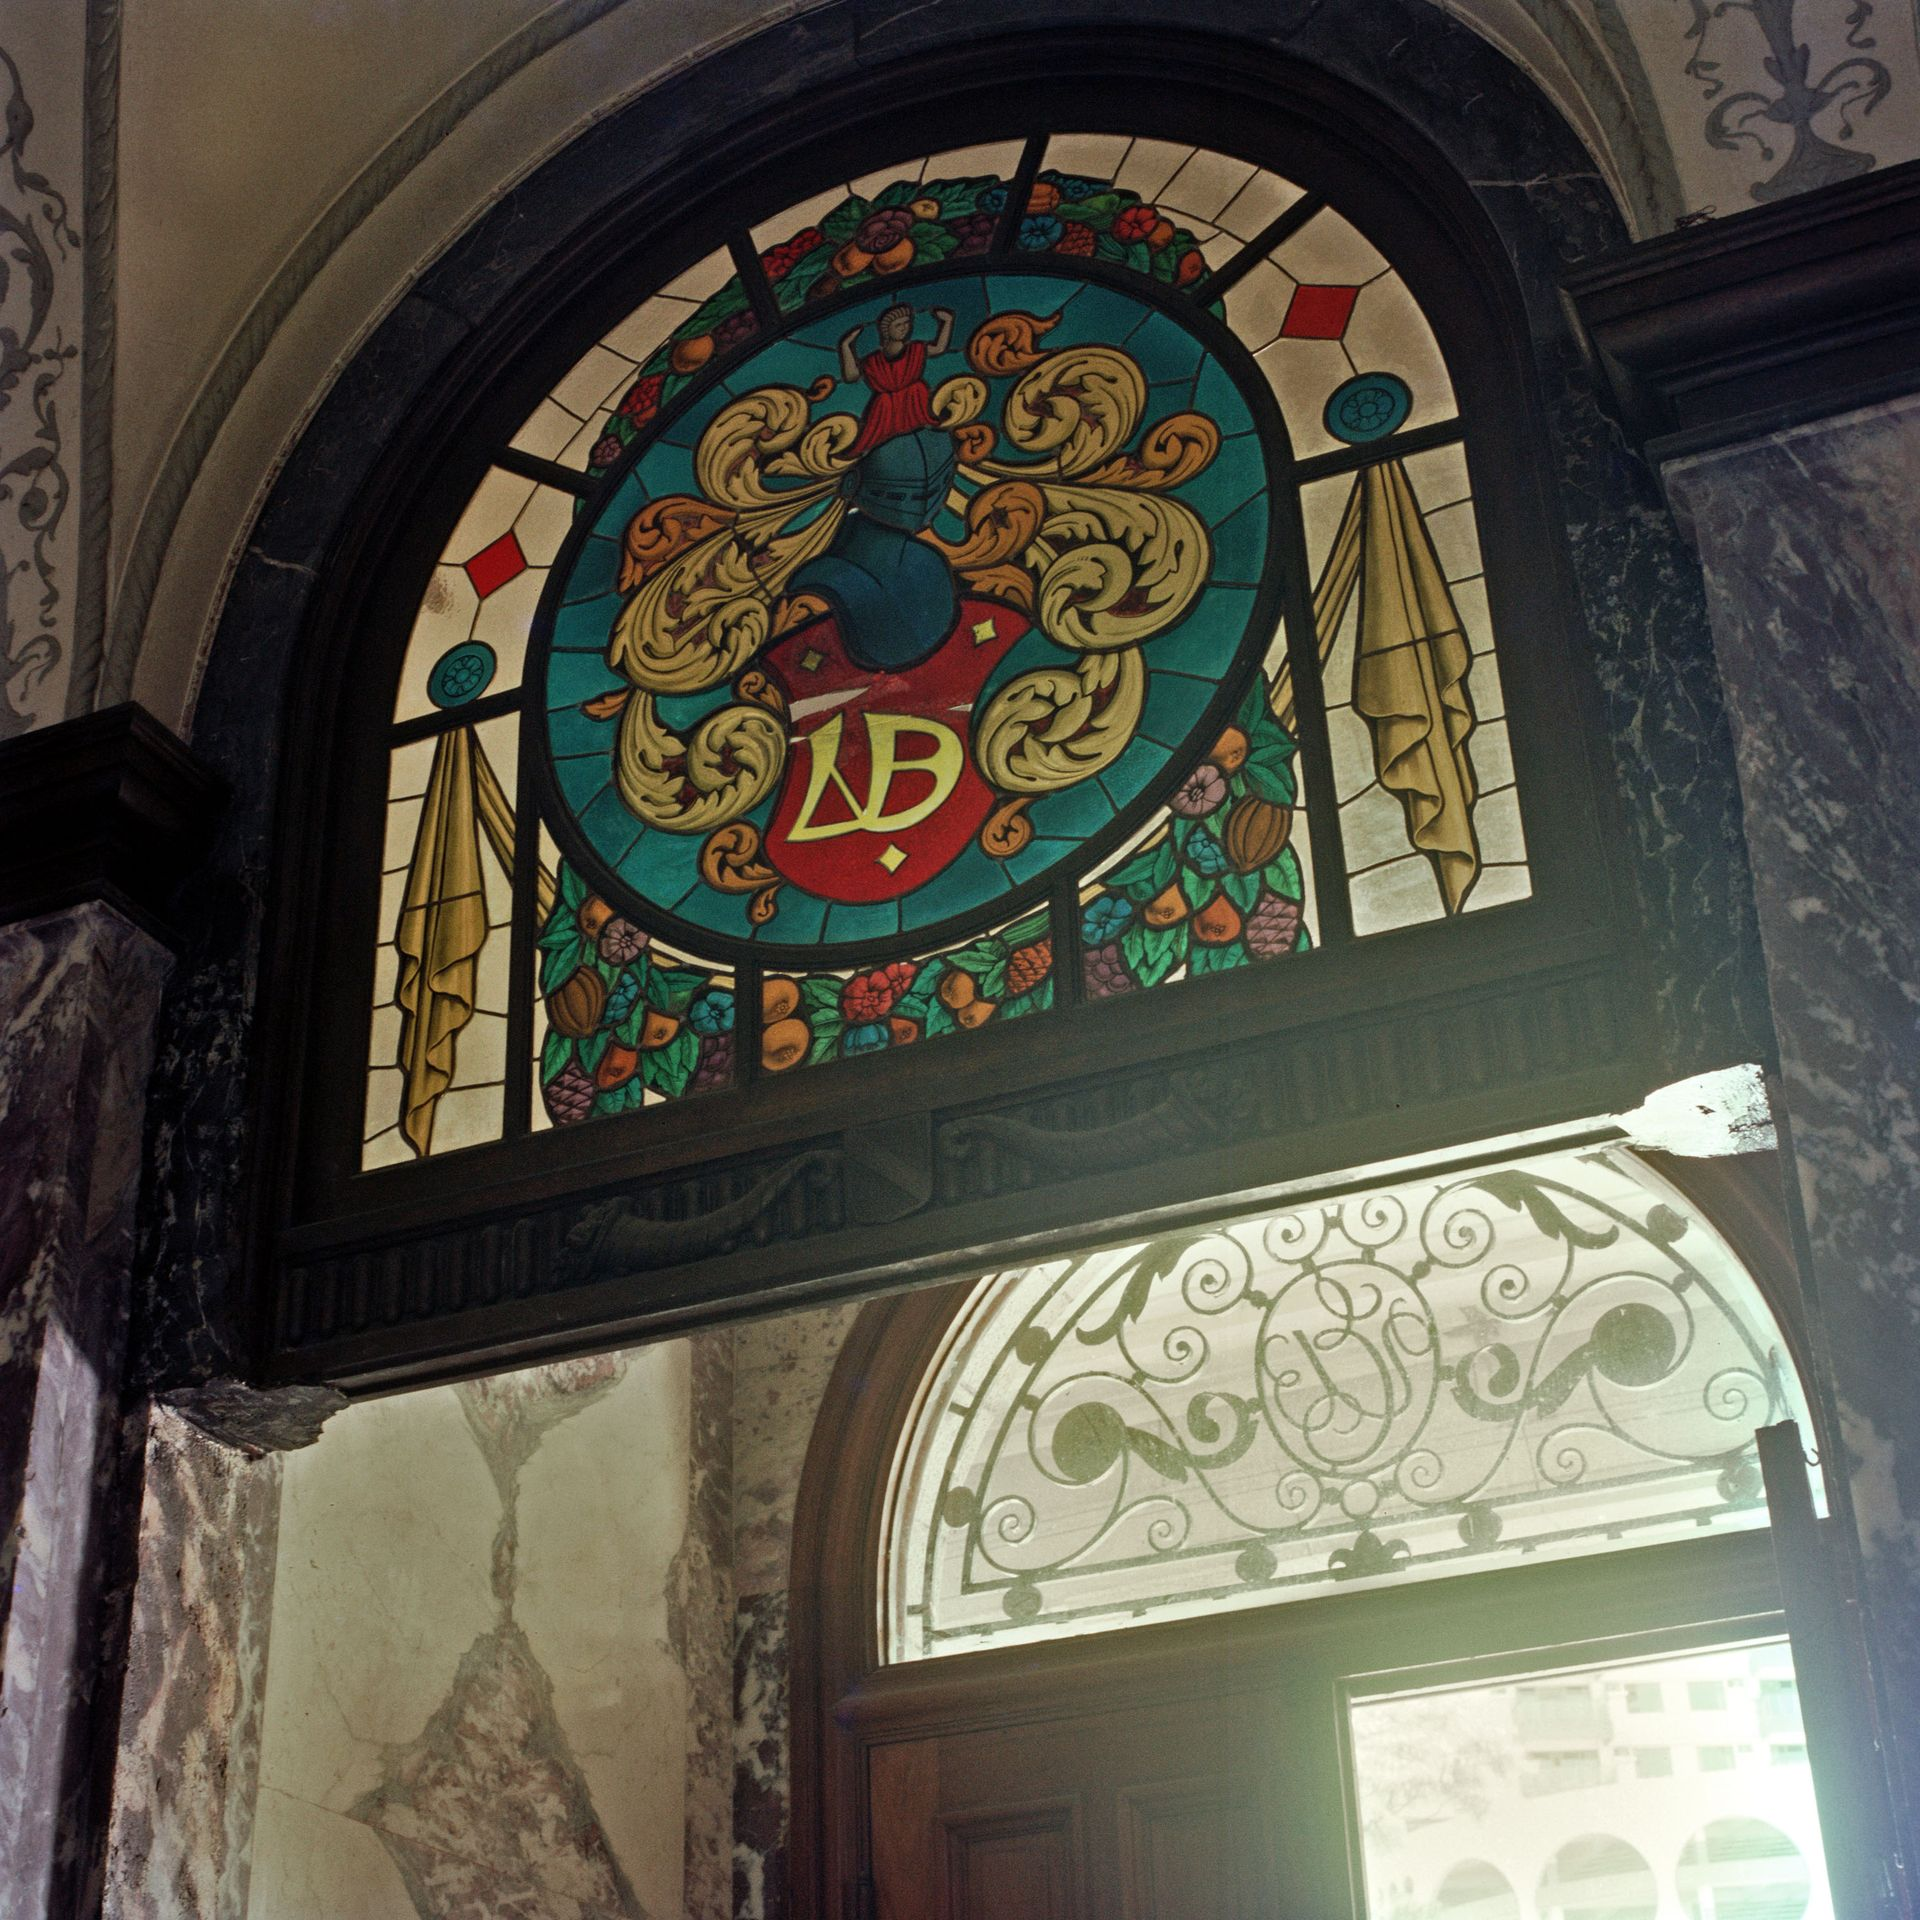 Entrance, Eucliff Mansion